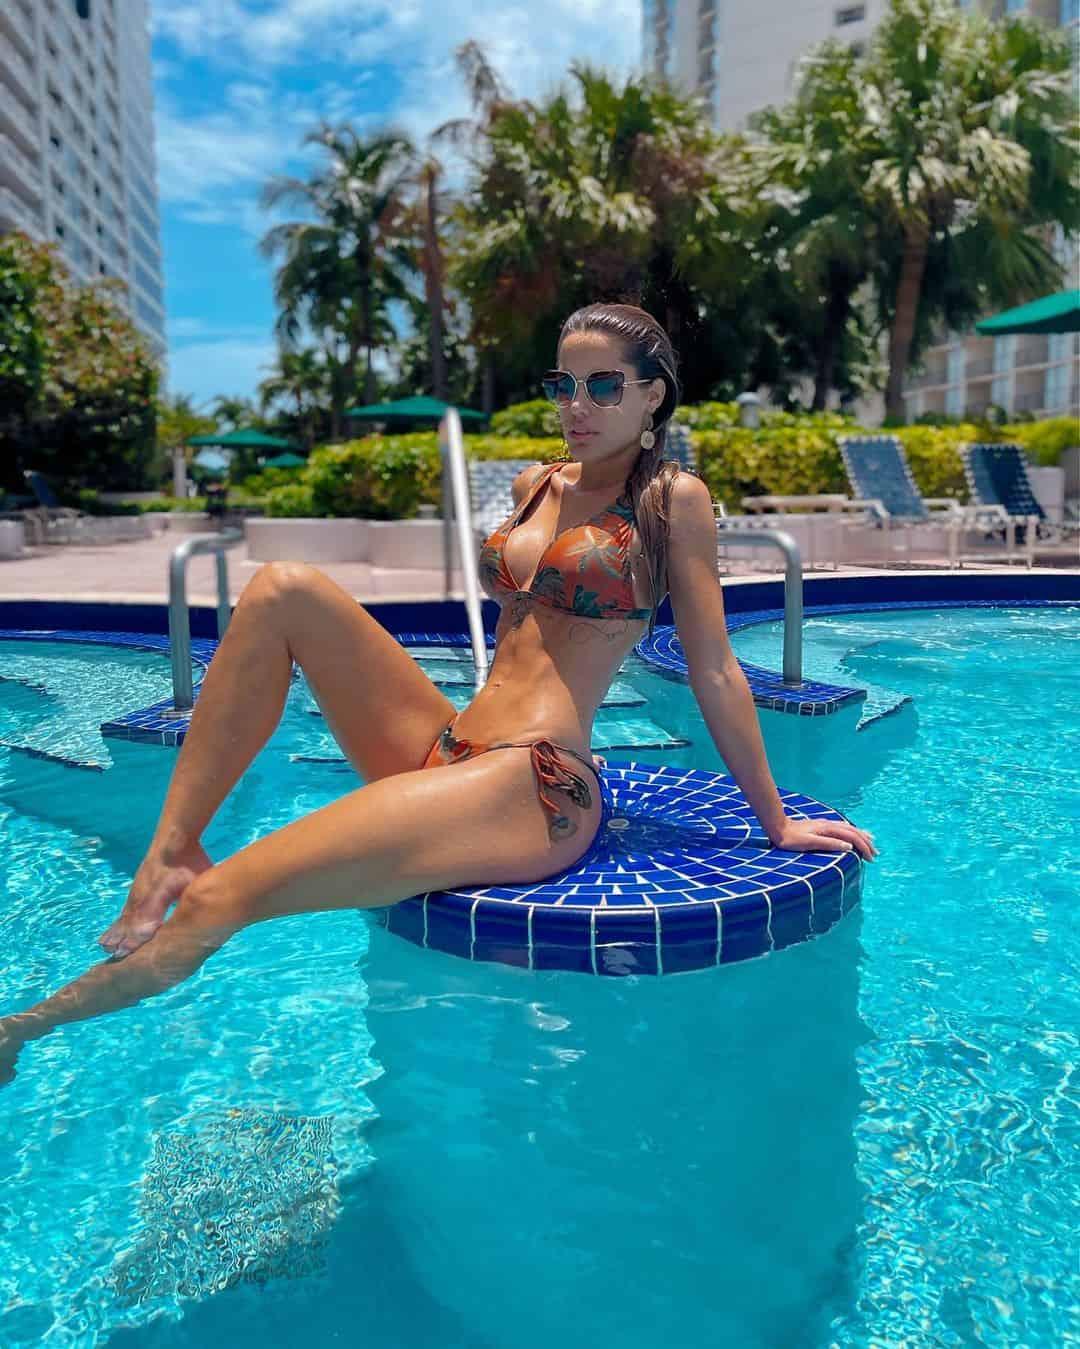 Gala Caldirola Posa En Bikini